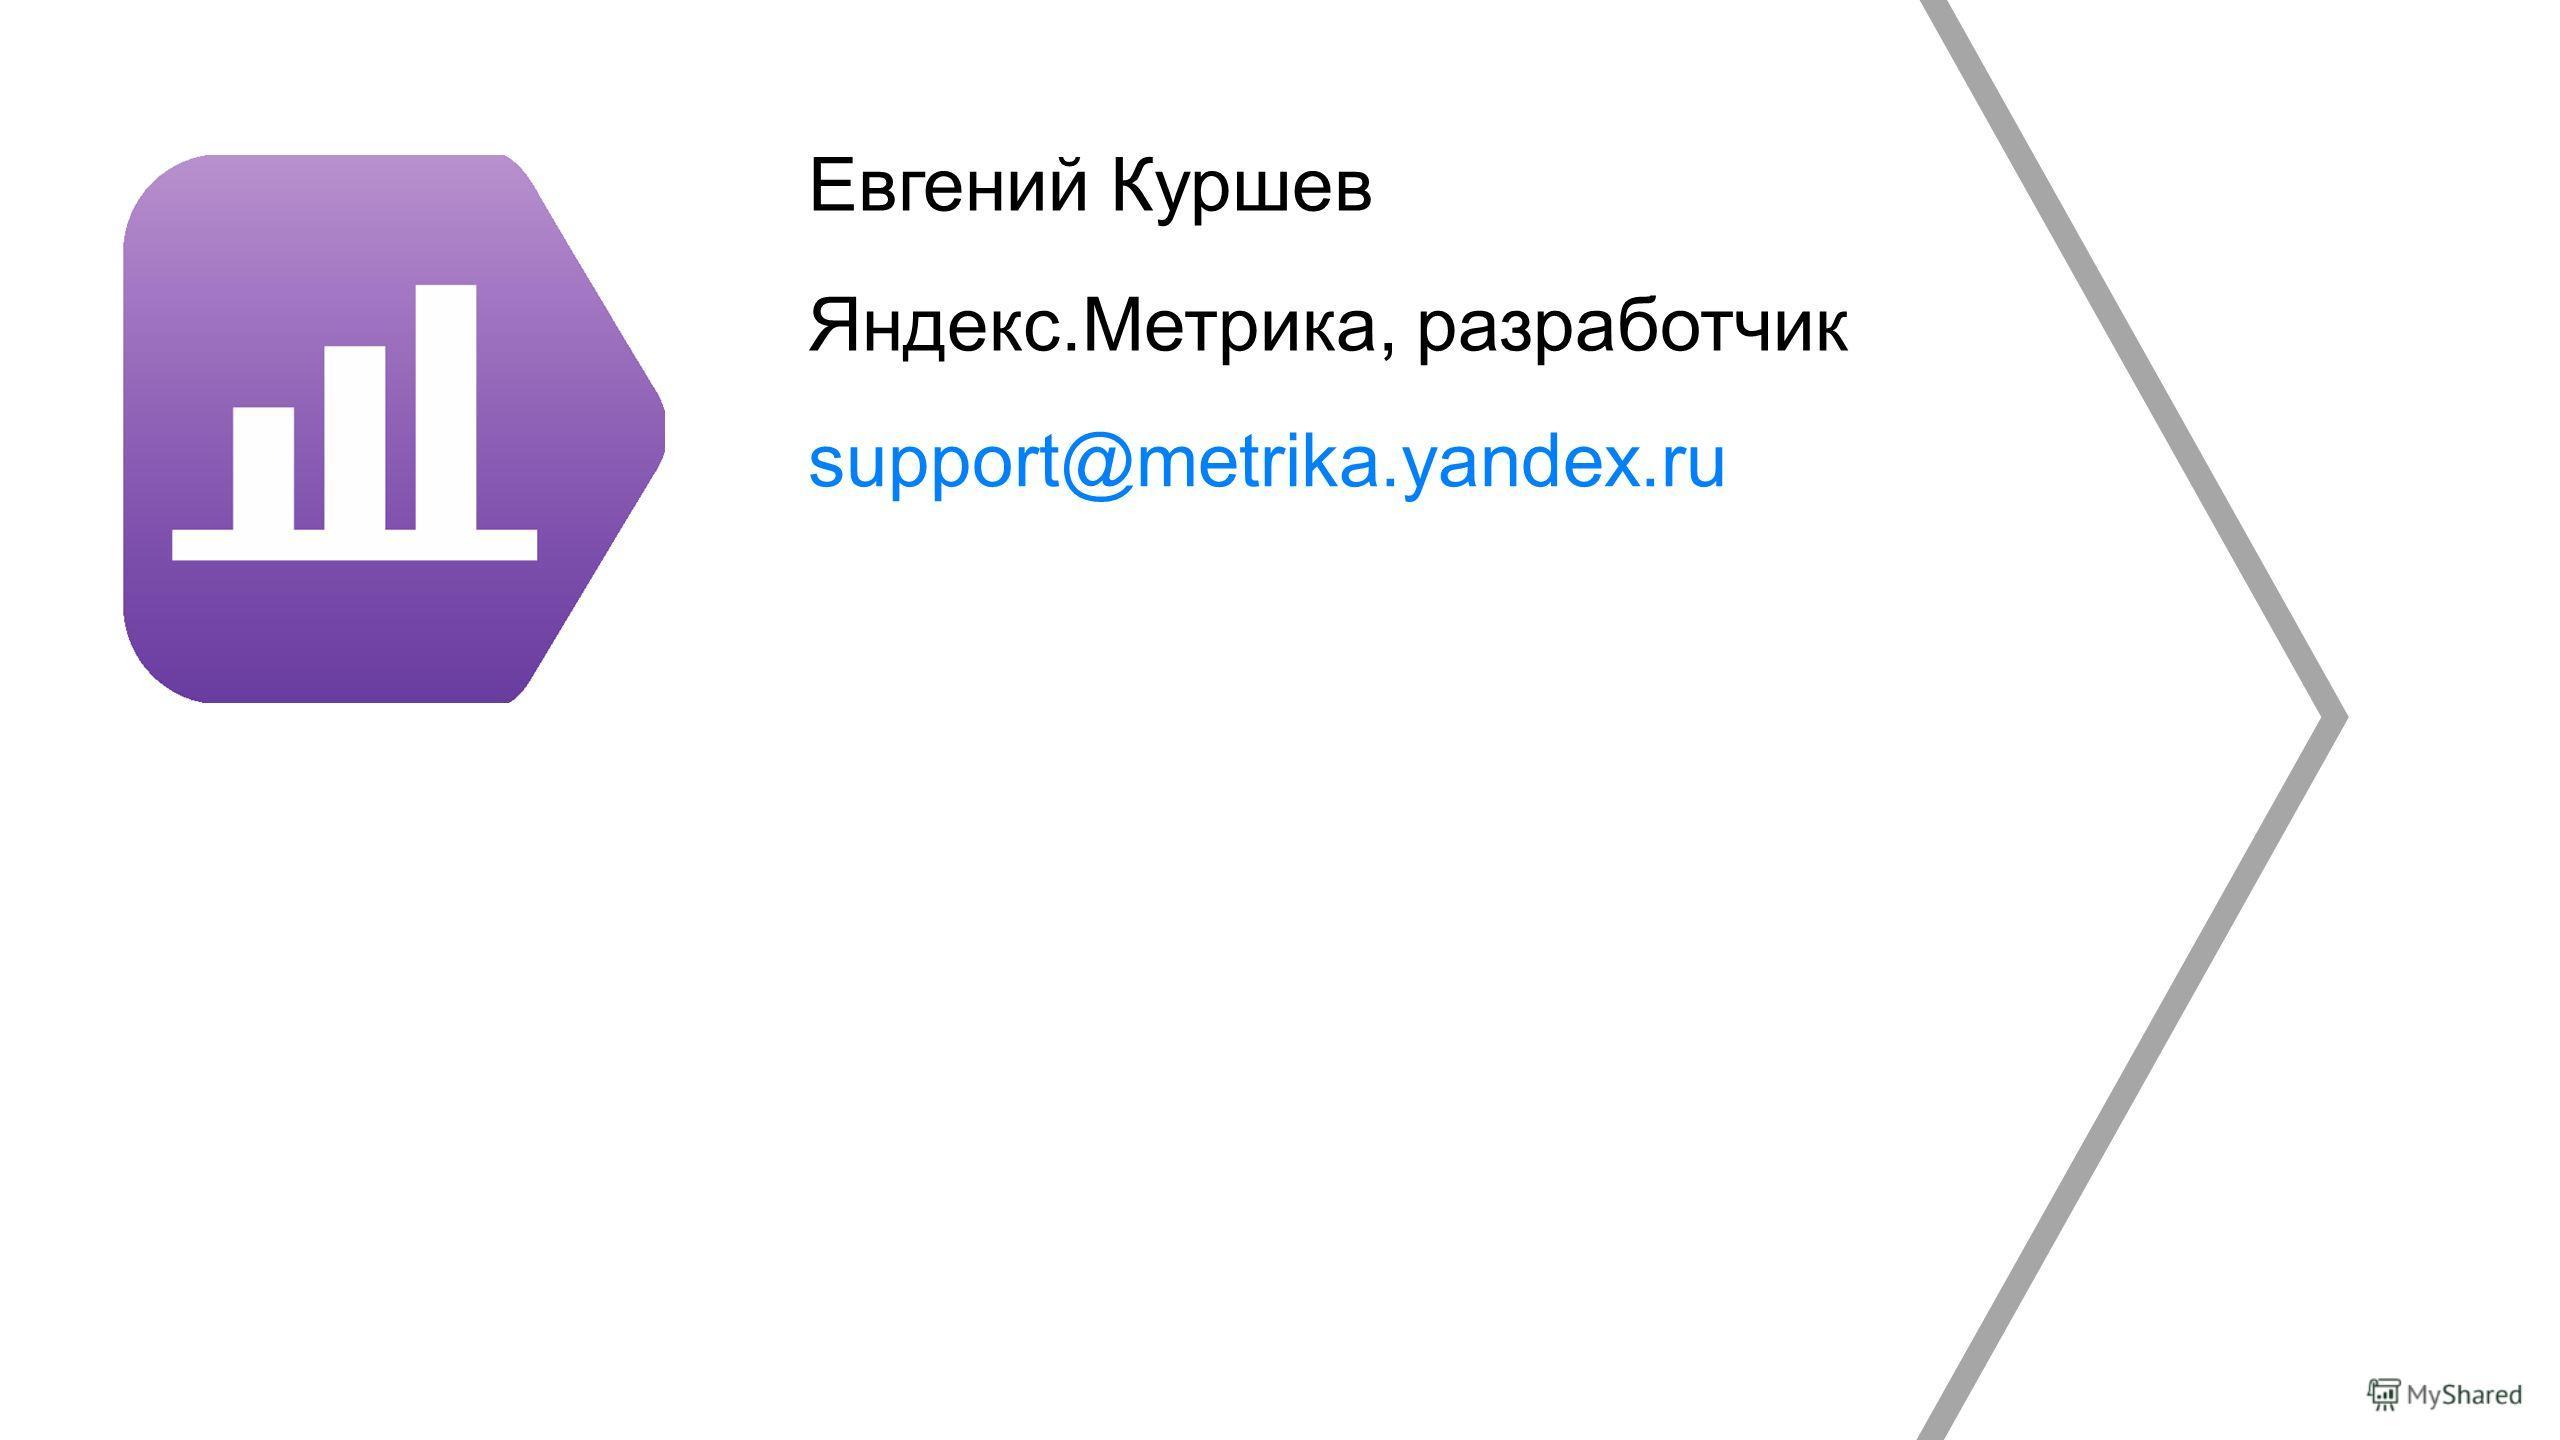 Спасибо Евгений Куршев Яндекс.Метрика, разработчик support@metrika.yandex.ru